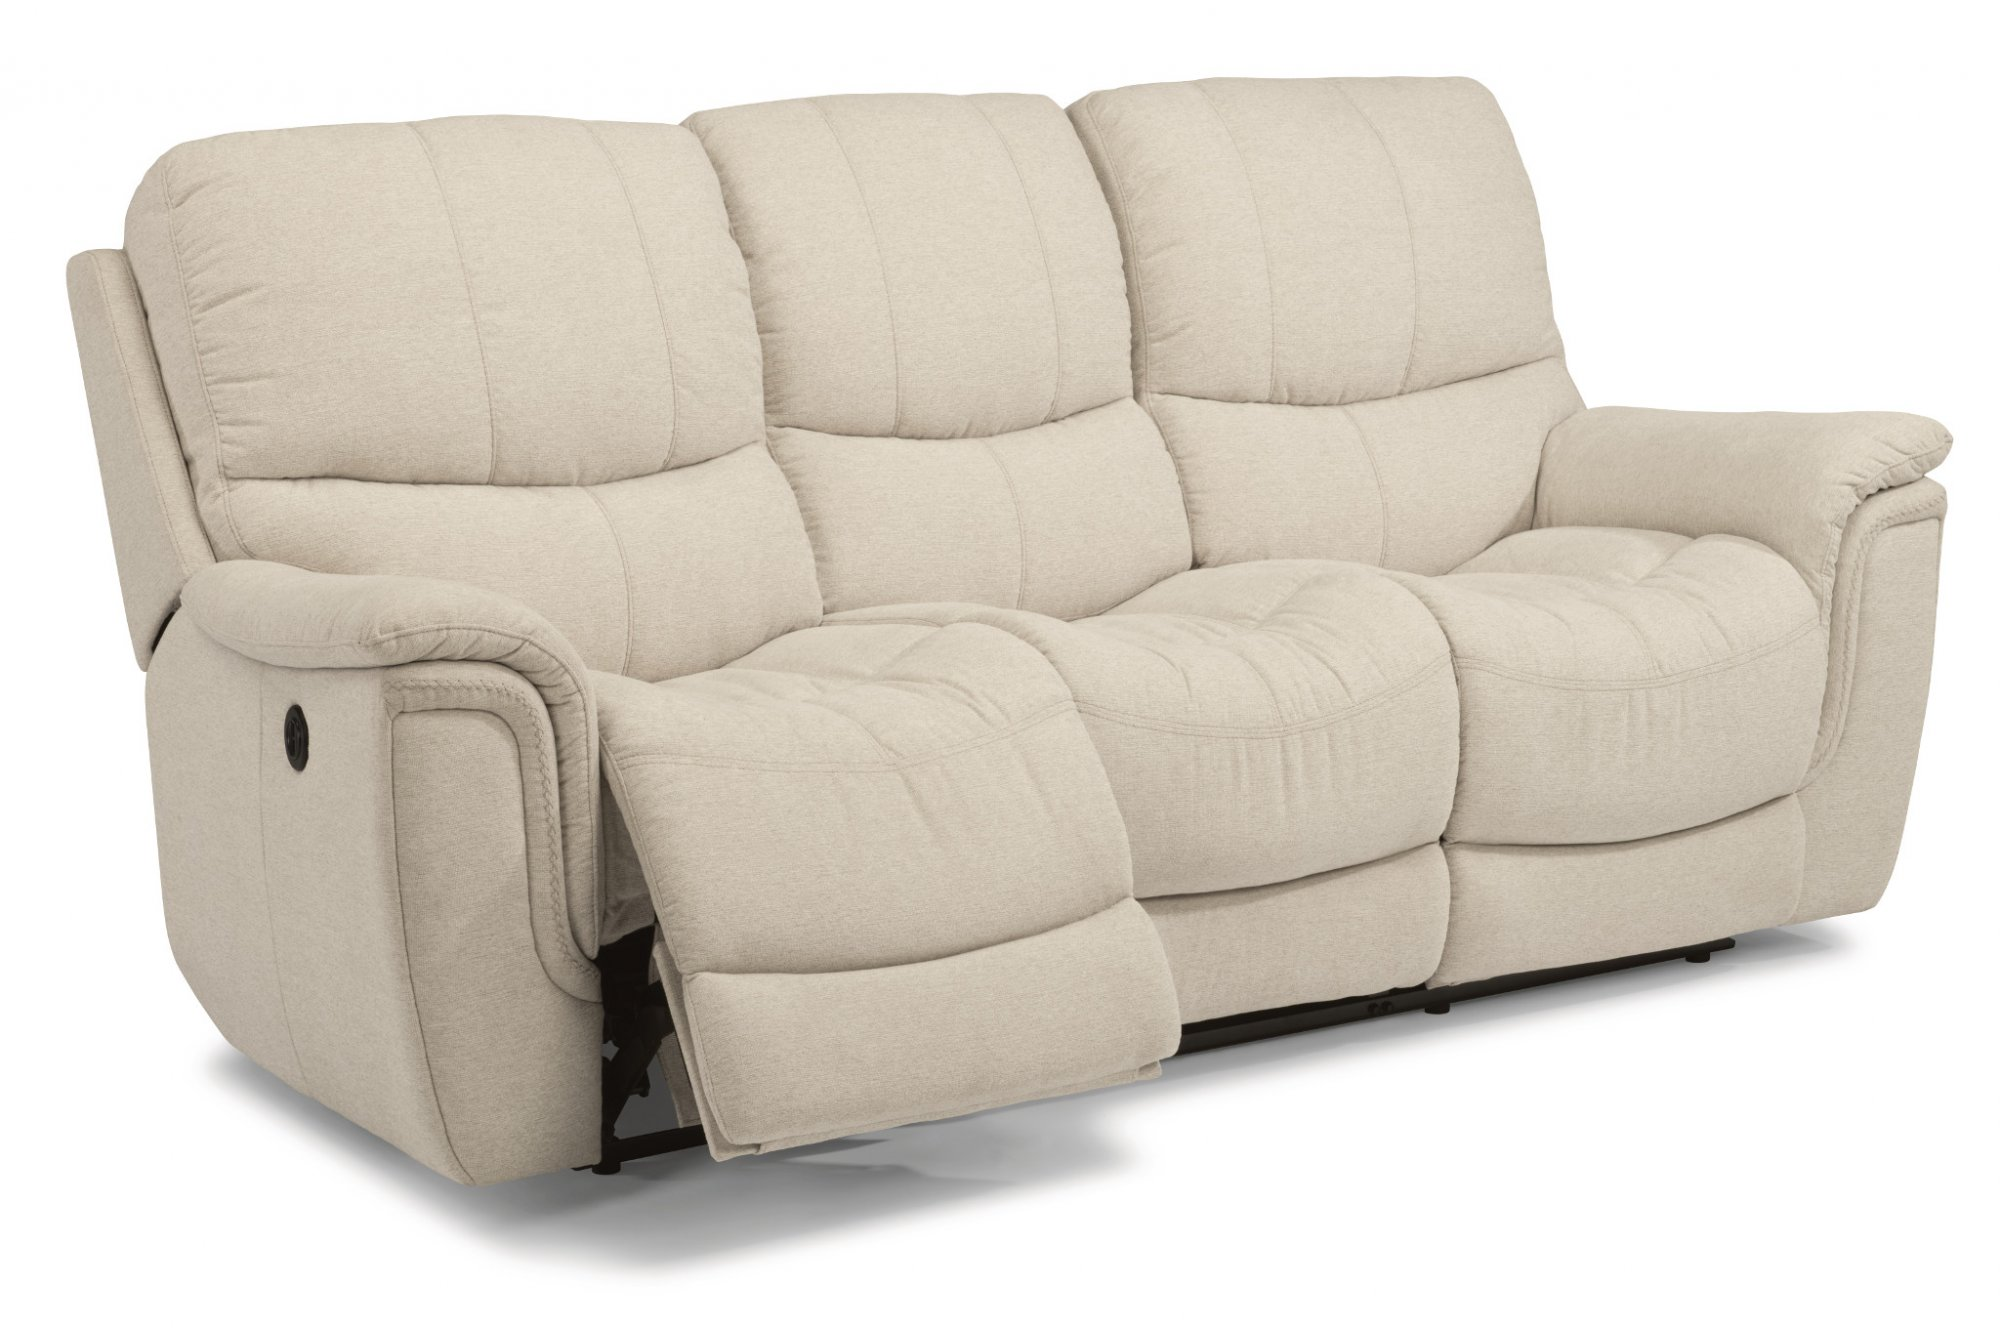 Fabric Power Reclining Sofa  sc 1 st  Flexsteel & Reclining Chairs \u0026 Sofas | Reclining Furniture from Flexsteel islam-shia.org